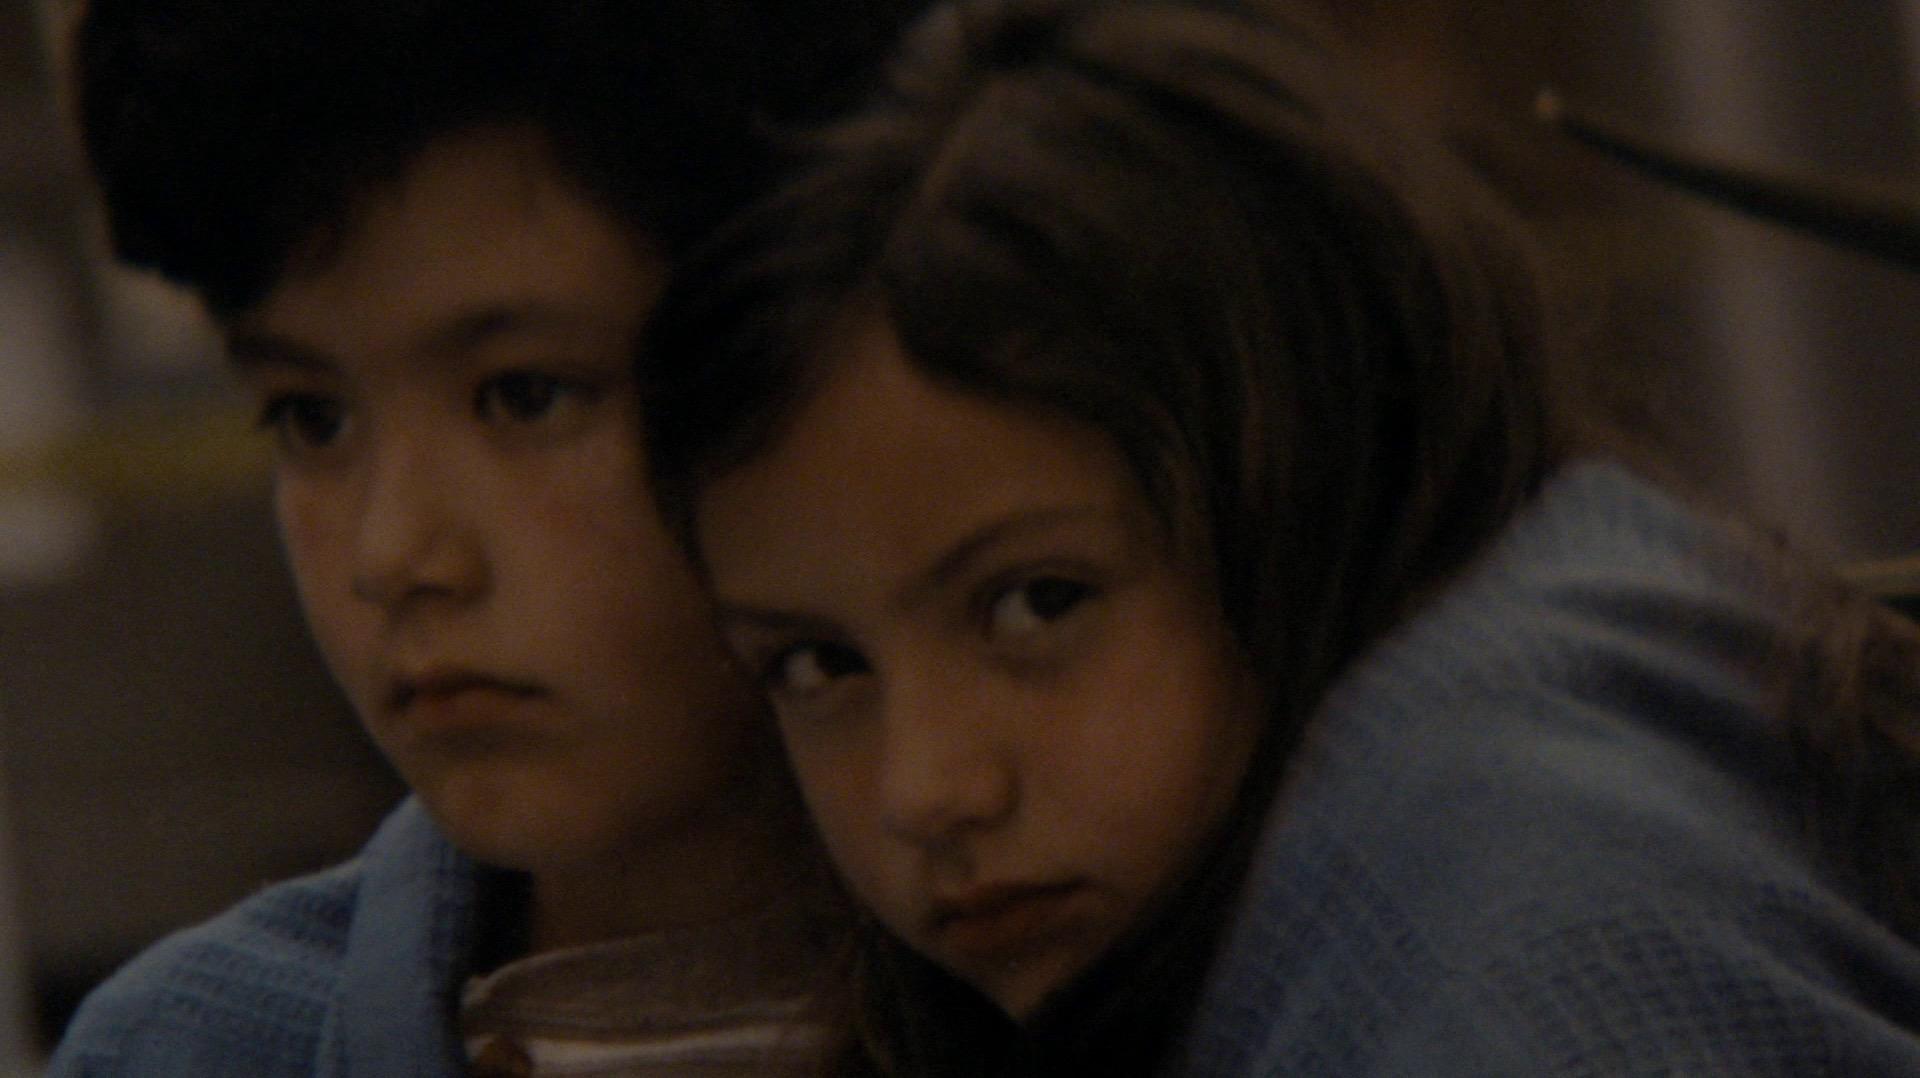 Laura and Leonard as children